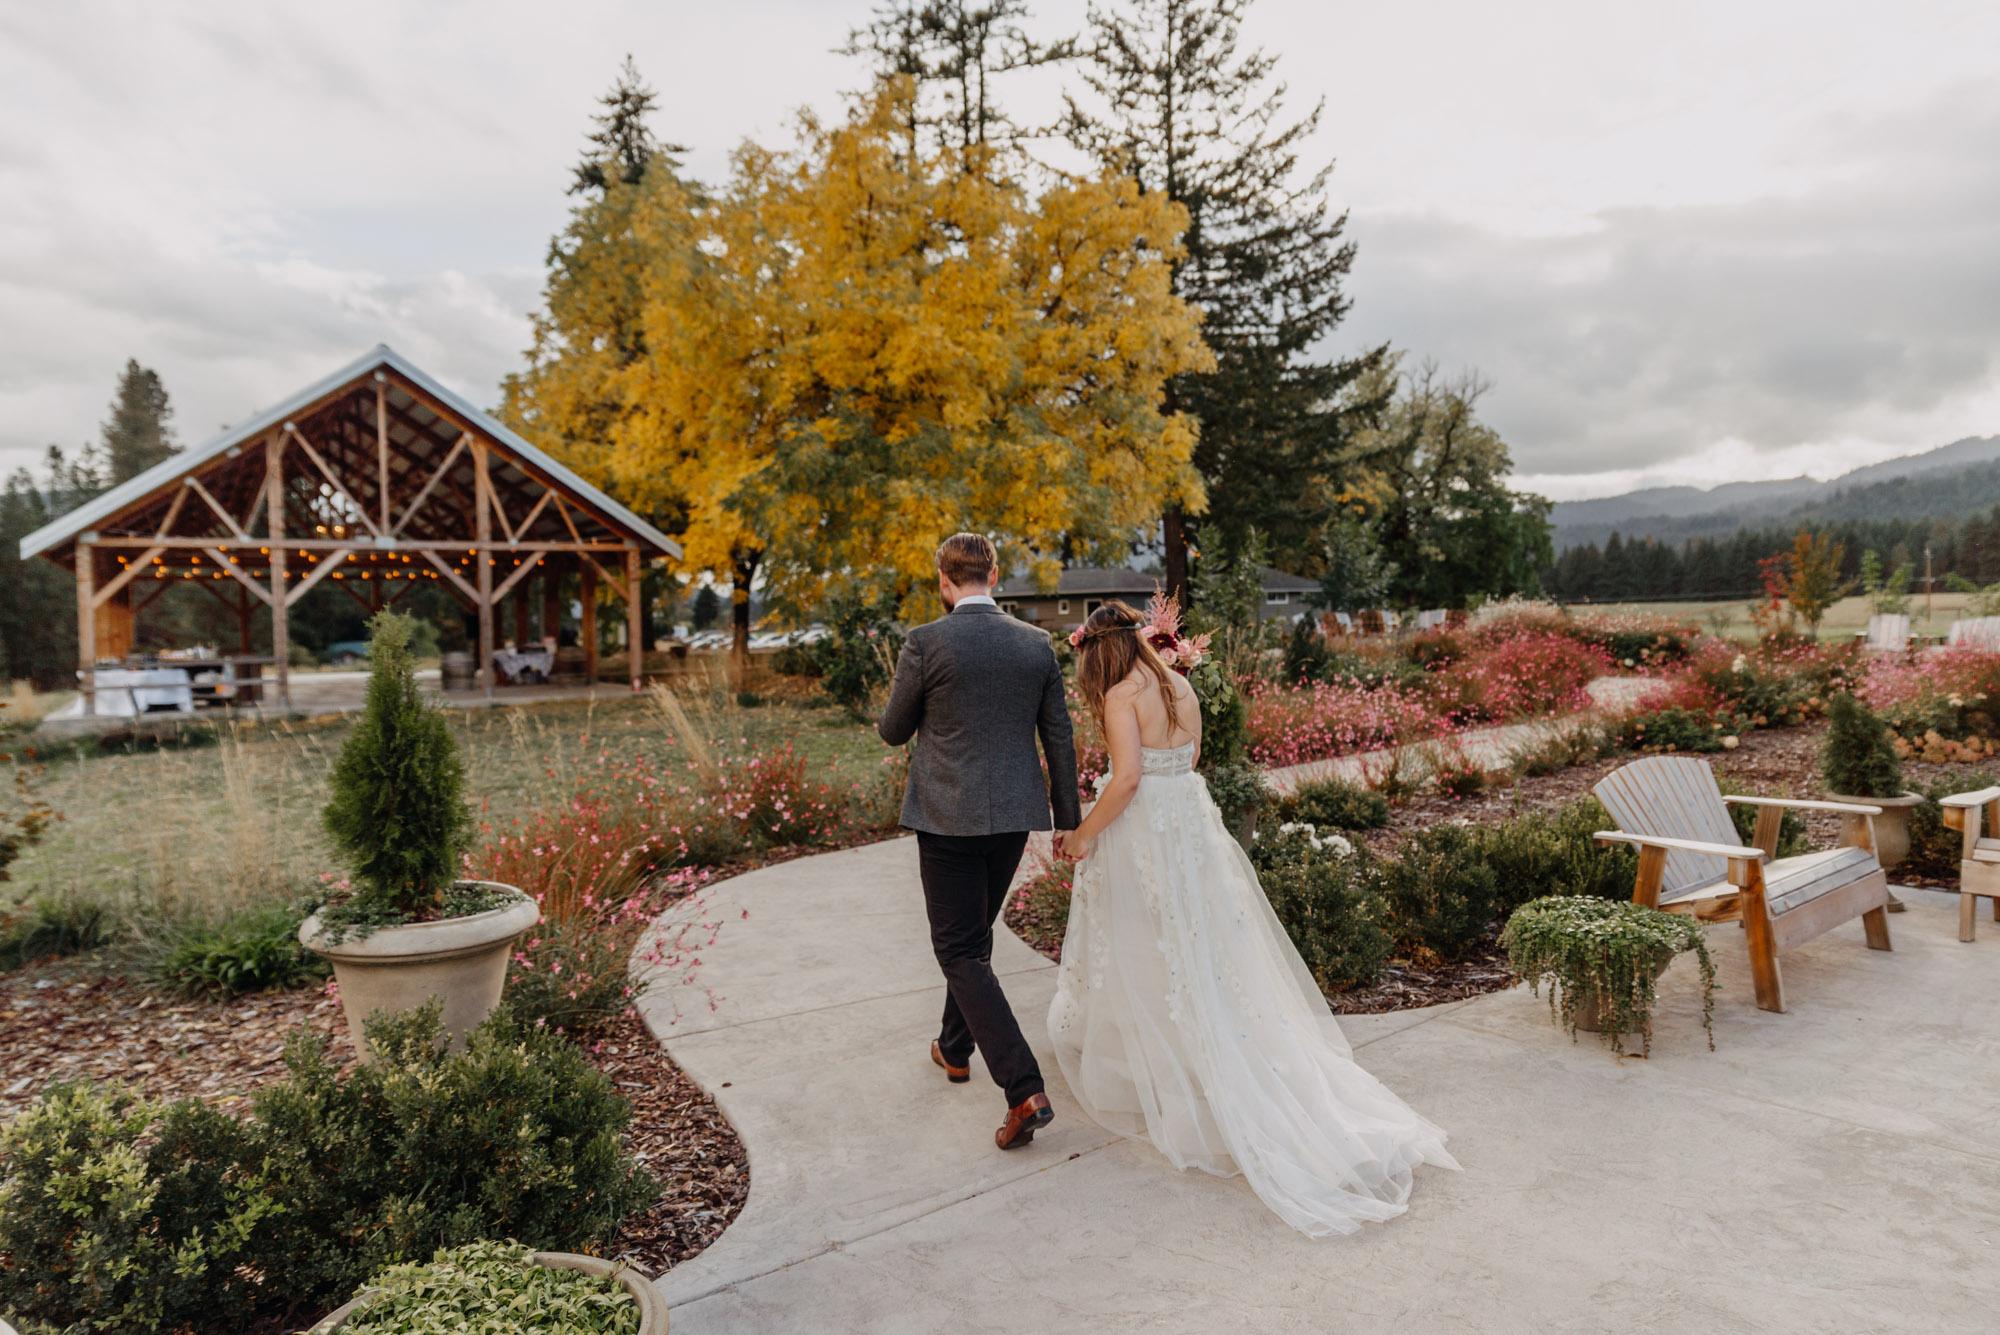 Outdoor-Summer-Ceremony-Washington-Wedding-Rainbow-5464.jpg